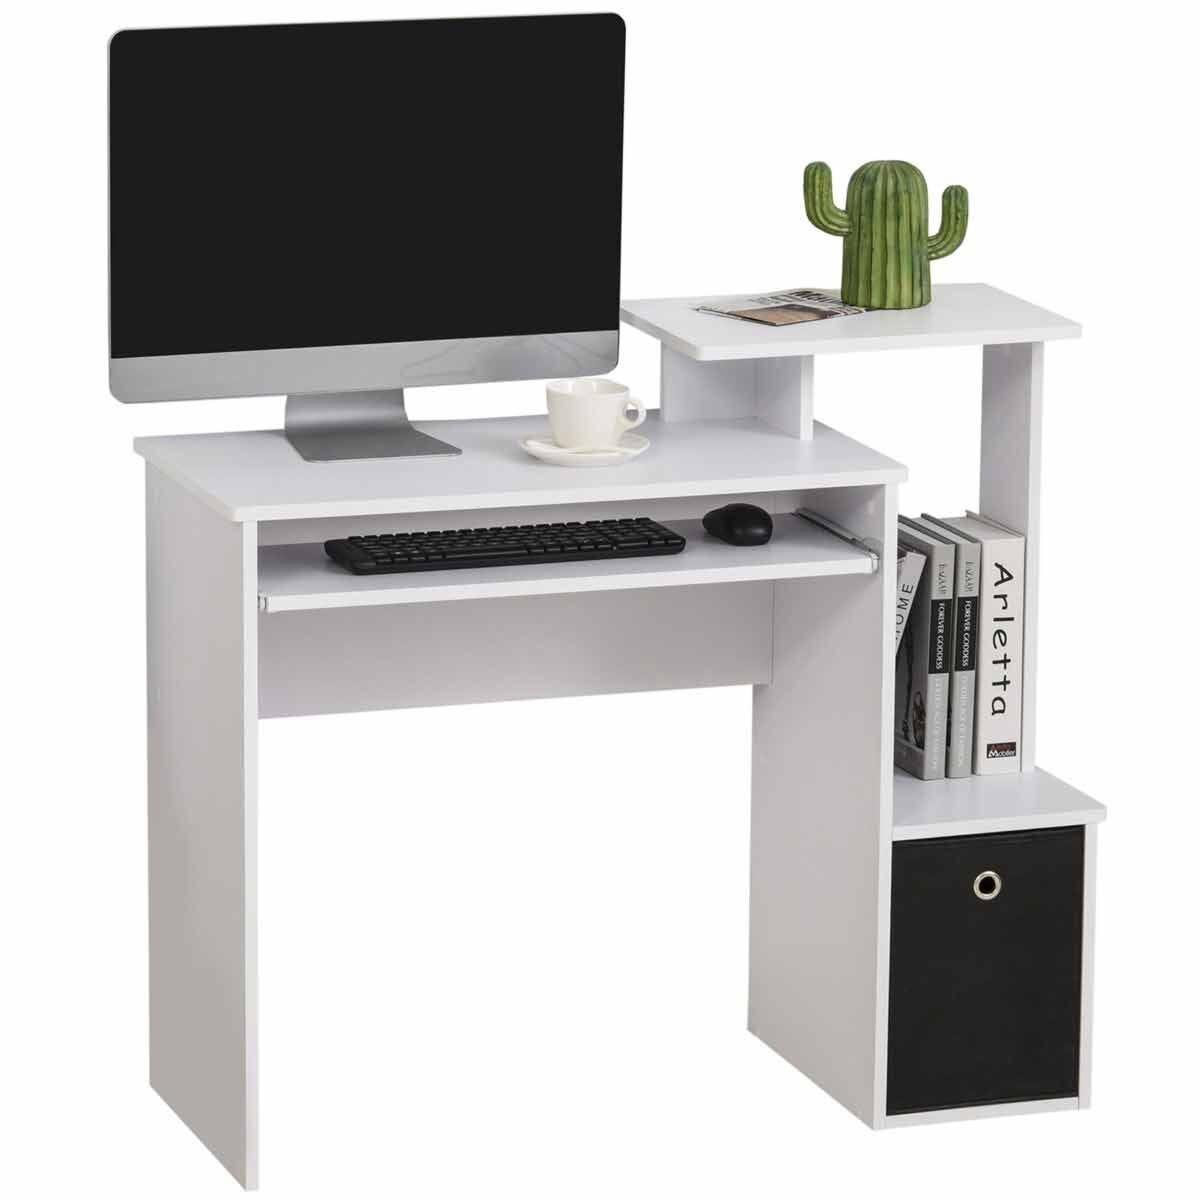 Aeric Computer Desk with Storage White